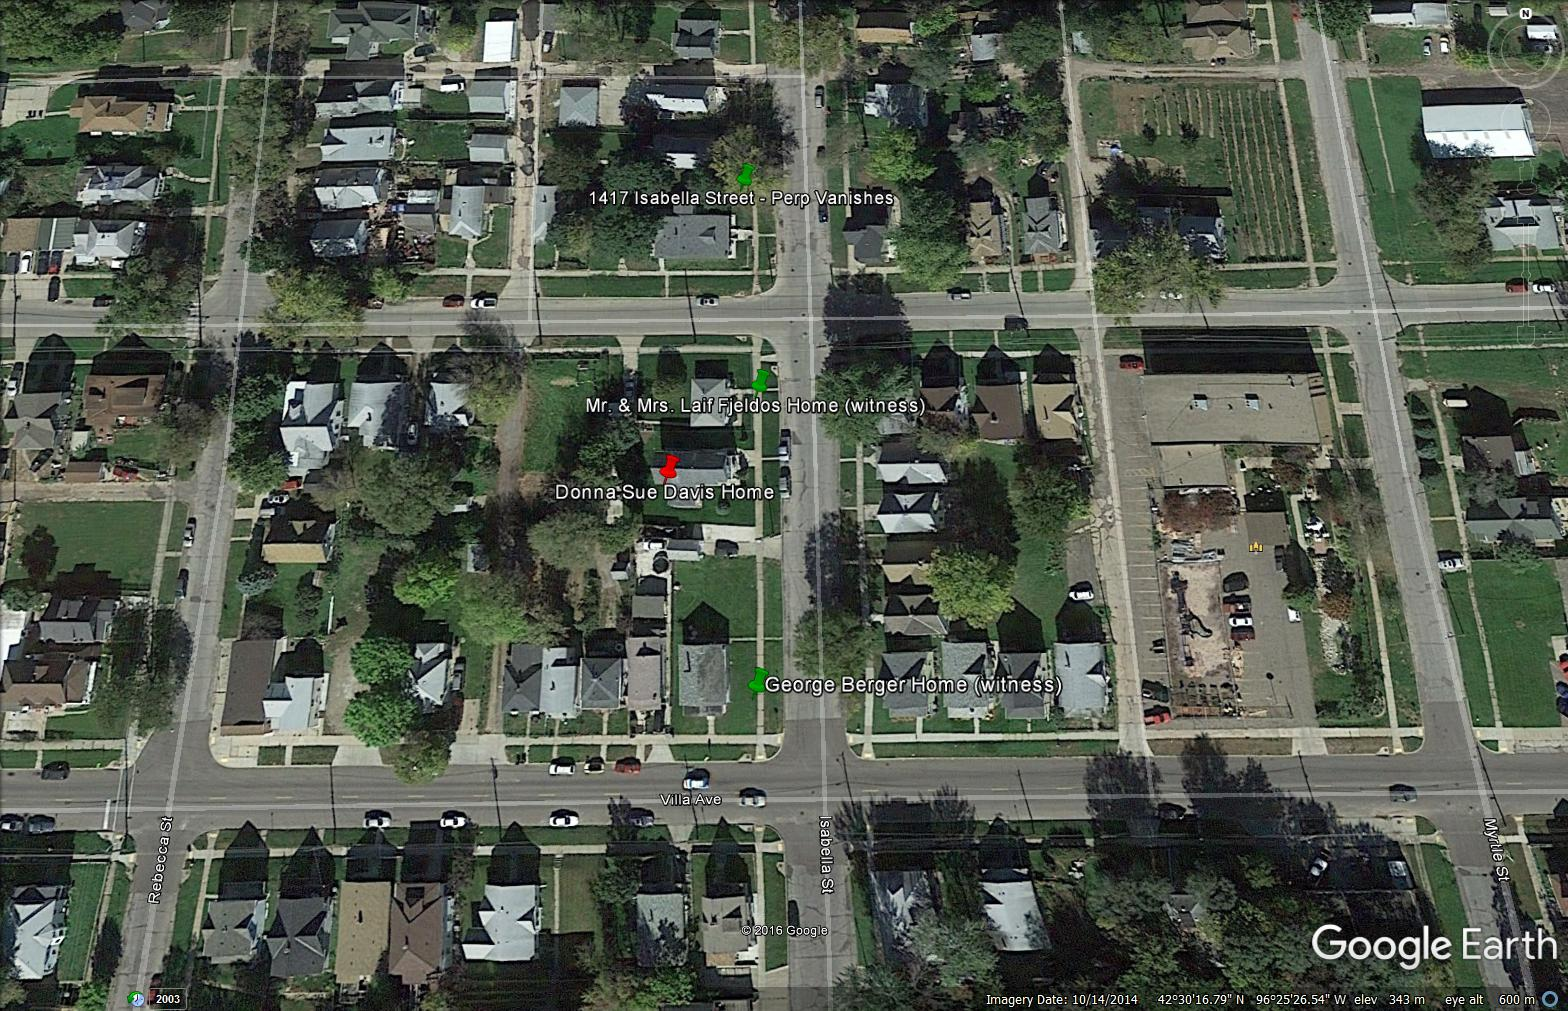 Image of Donna Sue Davis' neighborhood captured from Google Earth.